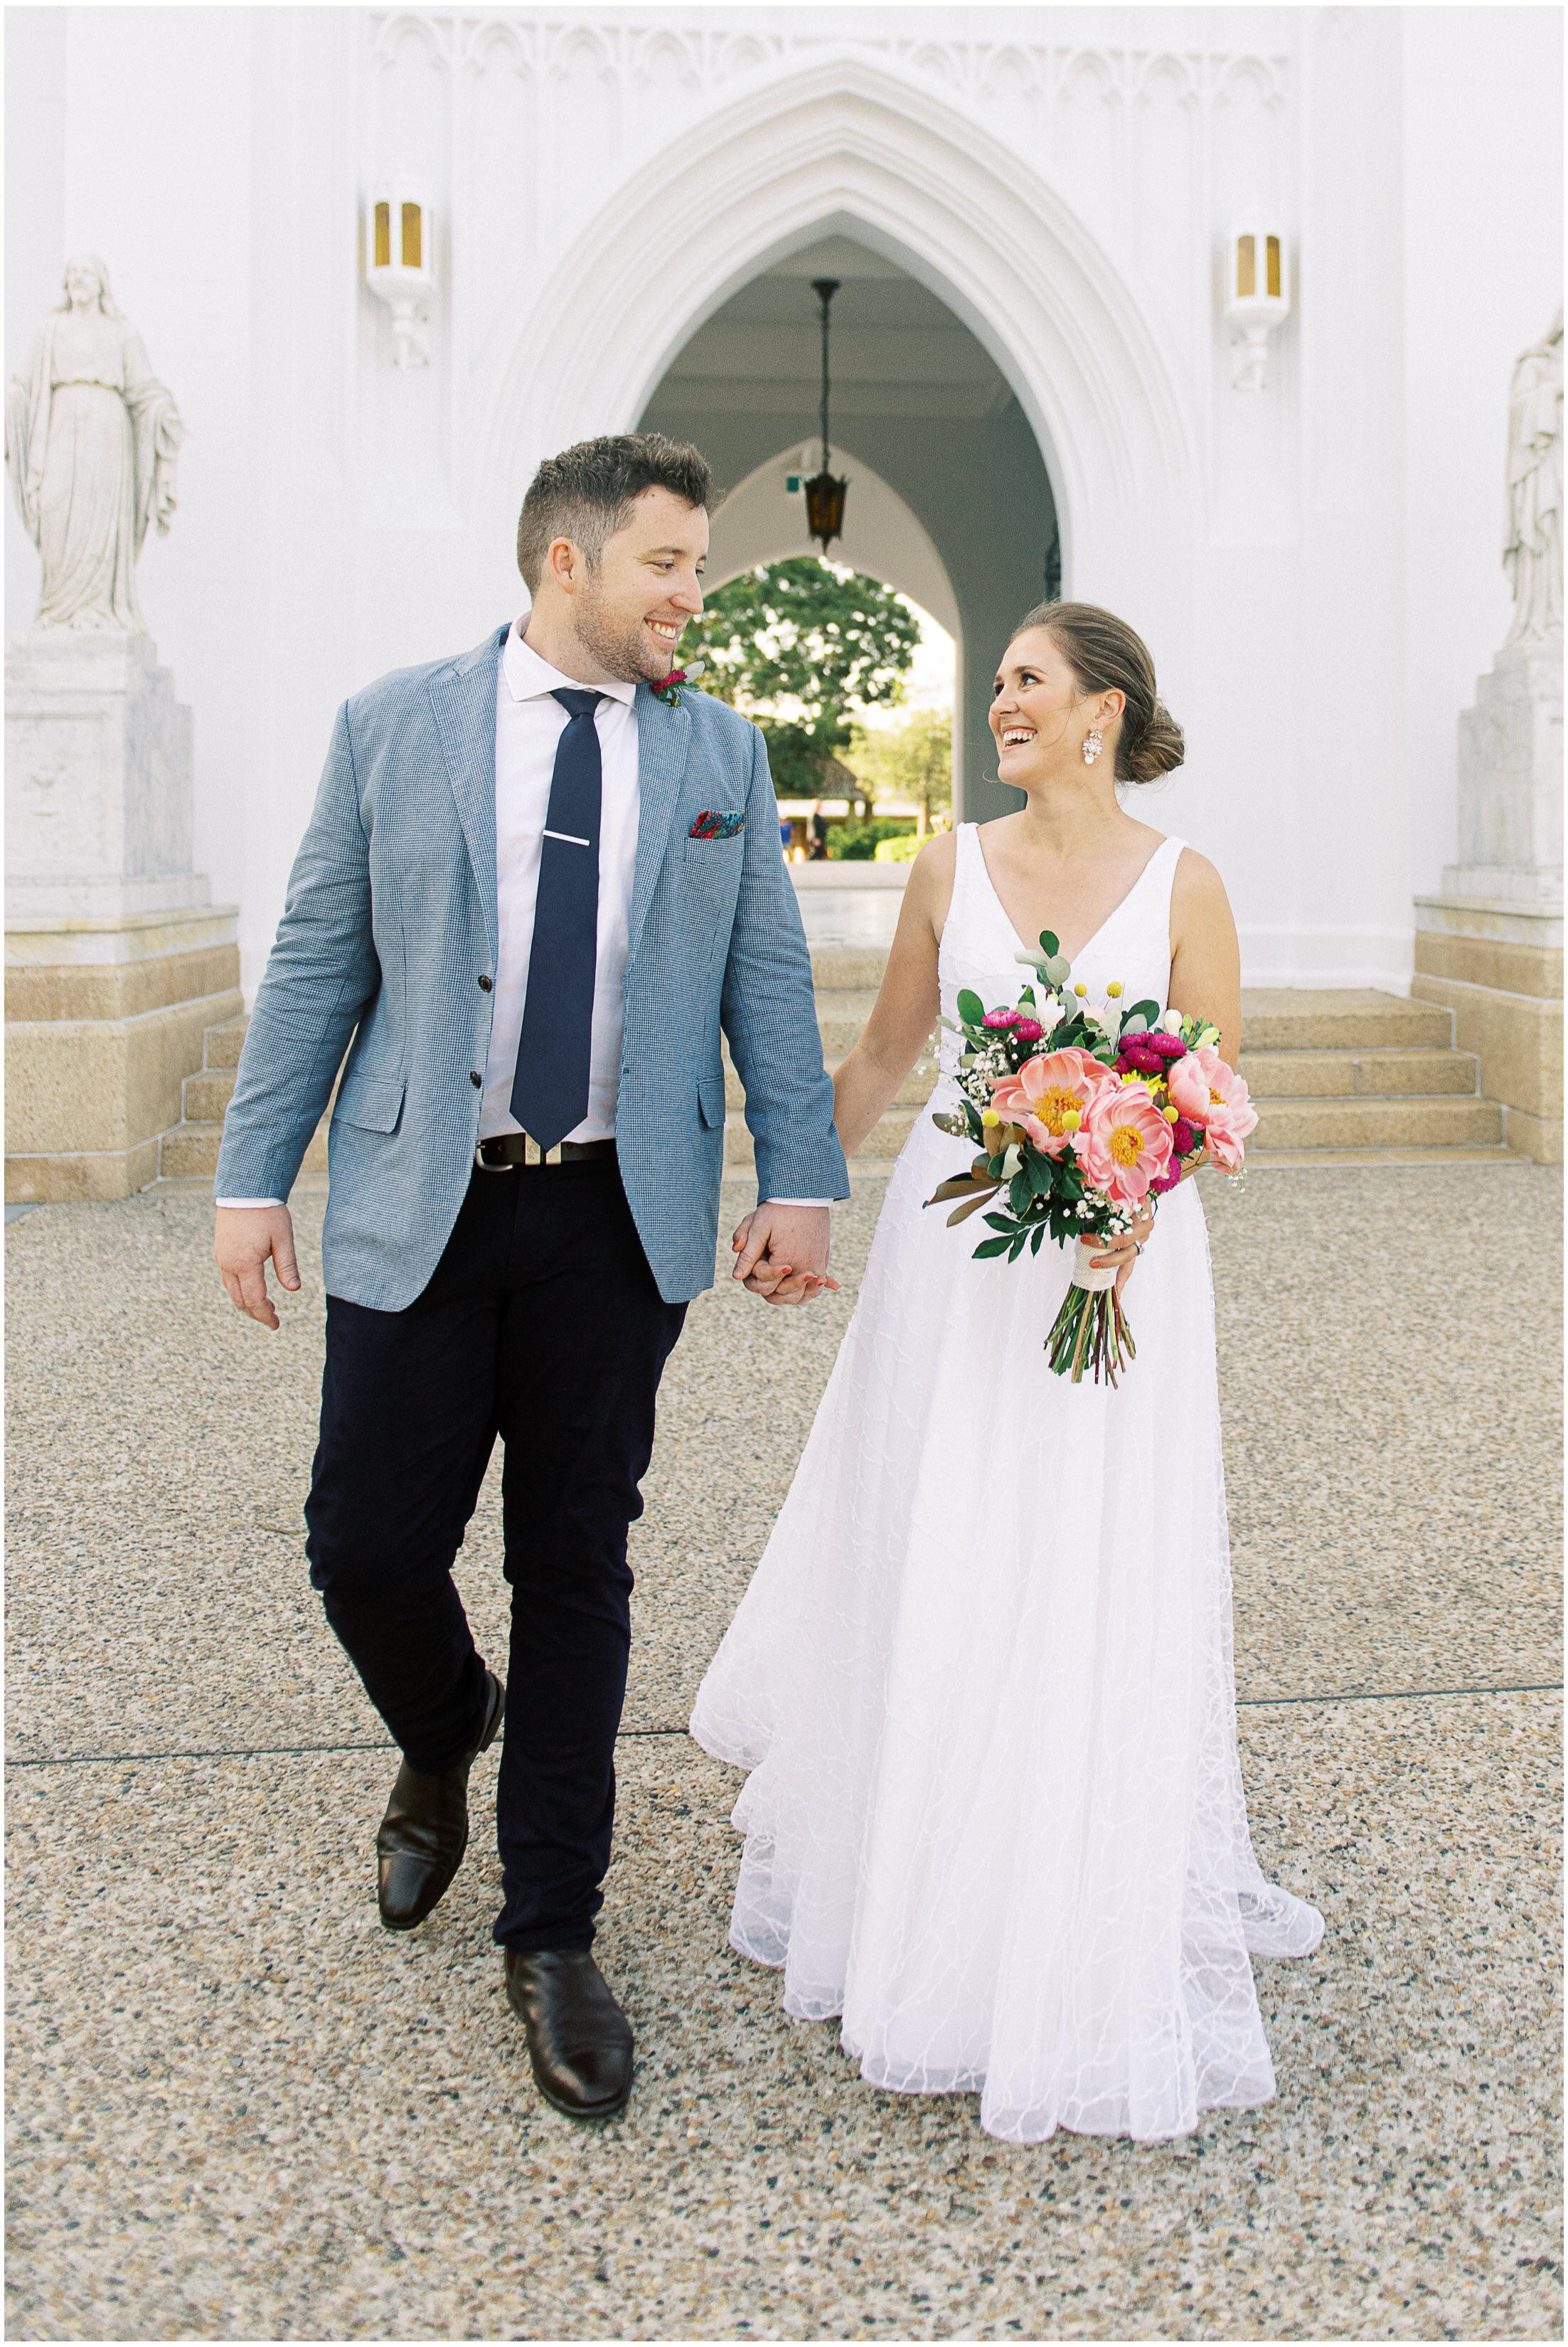 refinery-brisbane-wedding-photography-film-photographer-fine-art-26.jpg